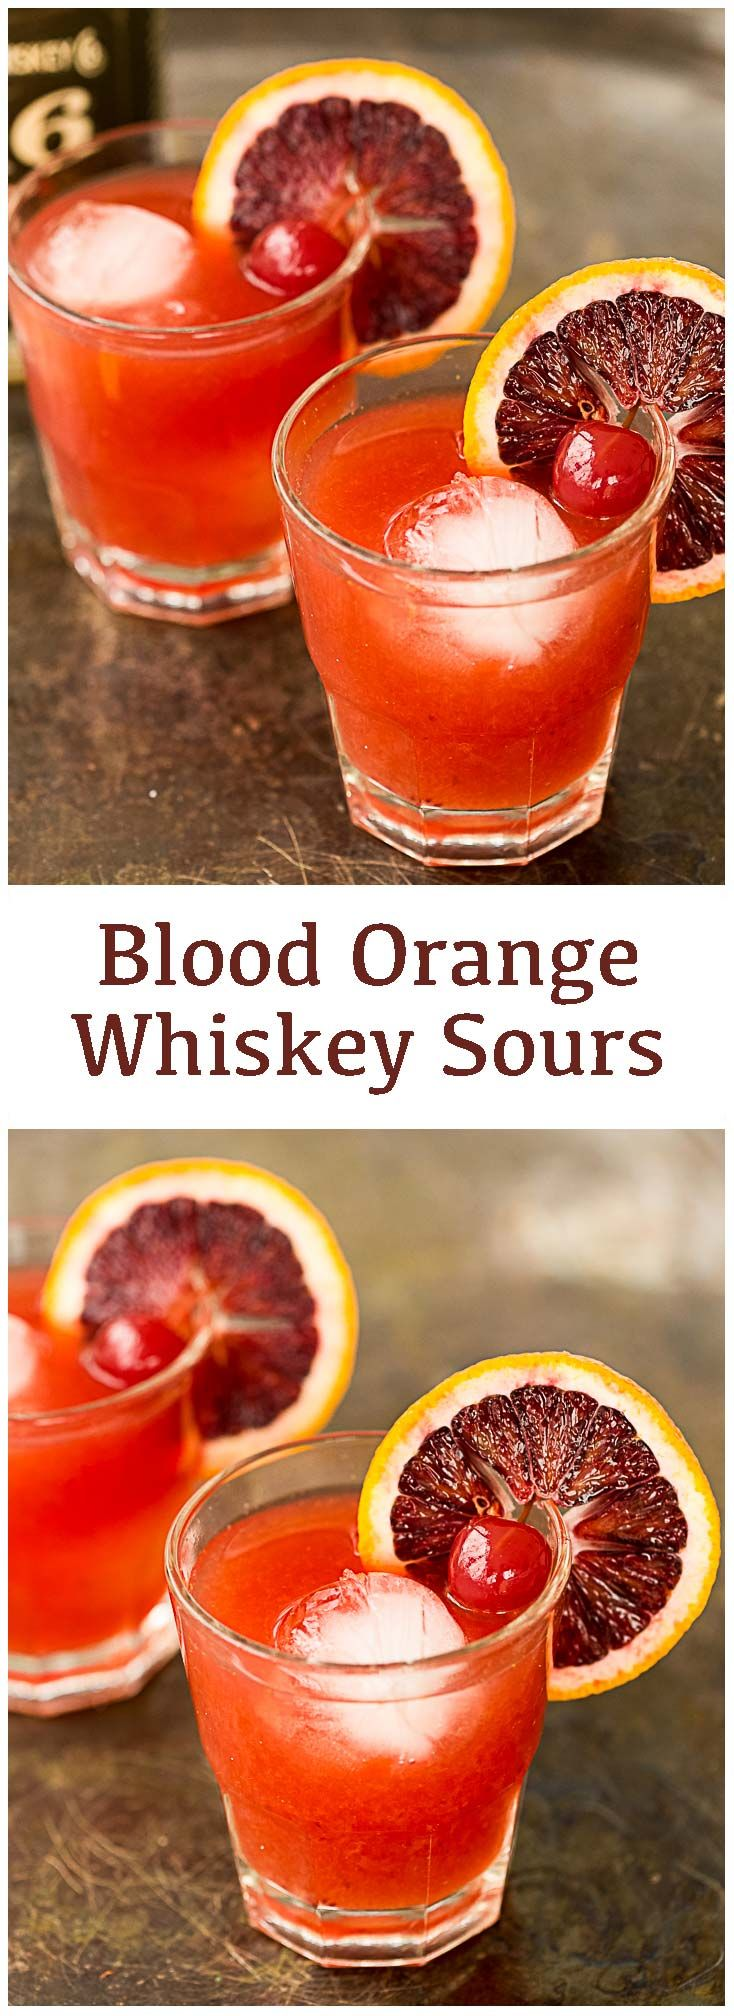 Blood Orange Whiskey Sours!